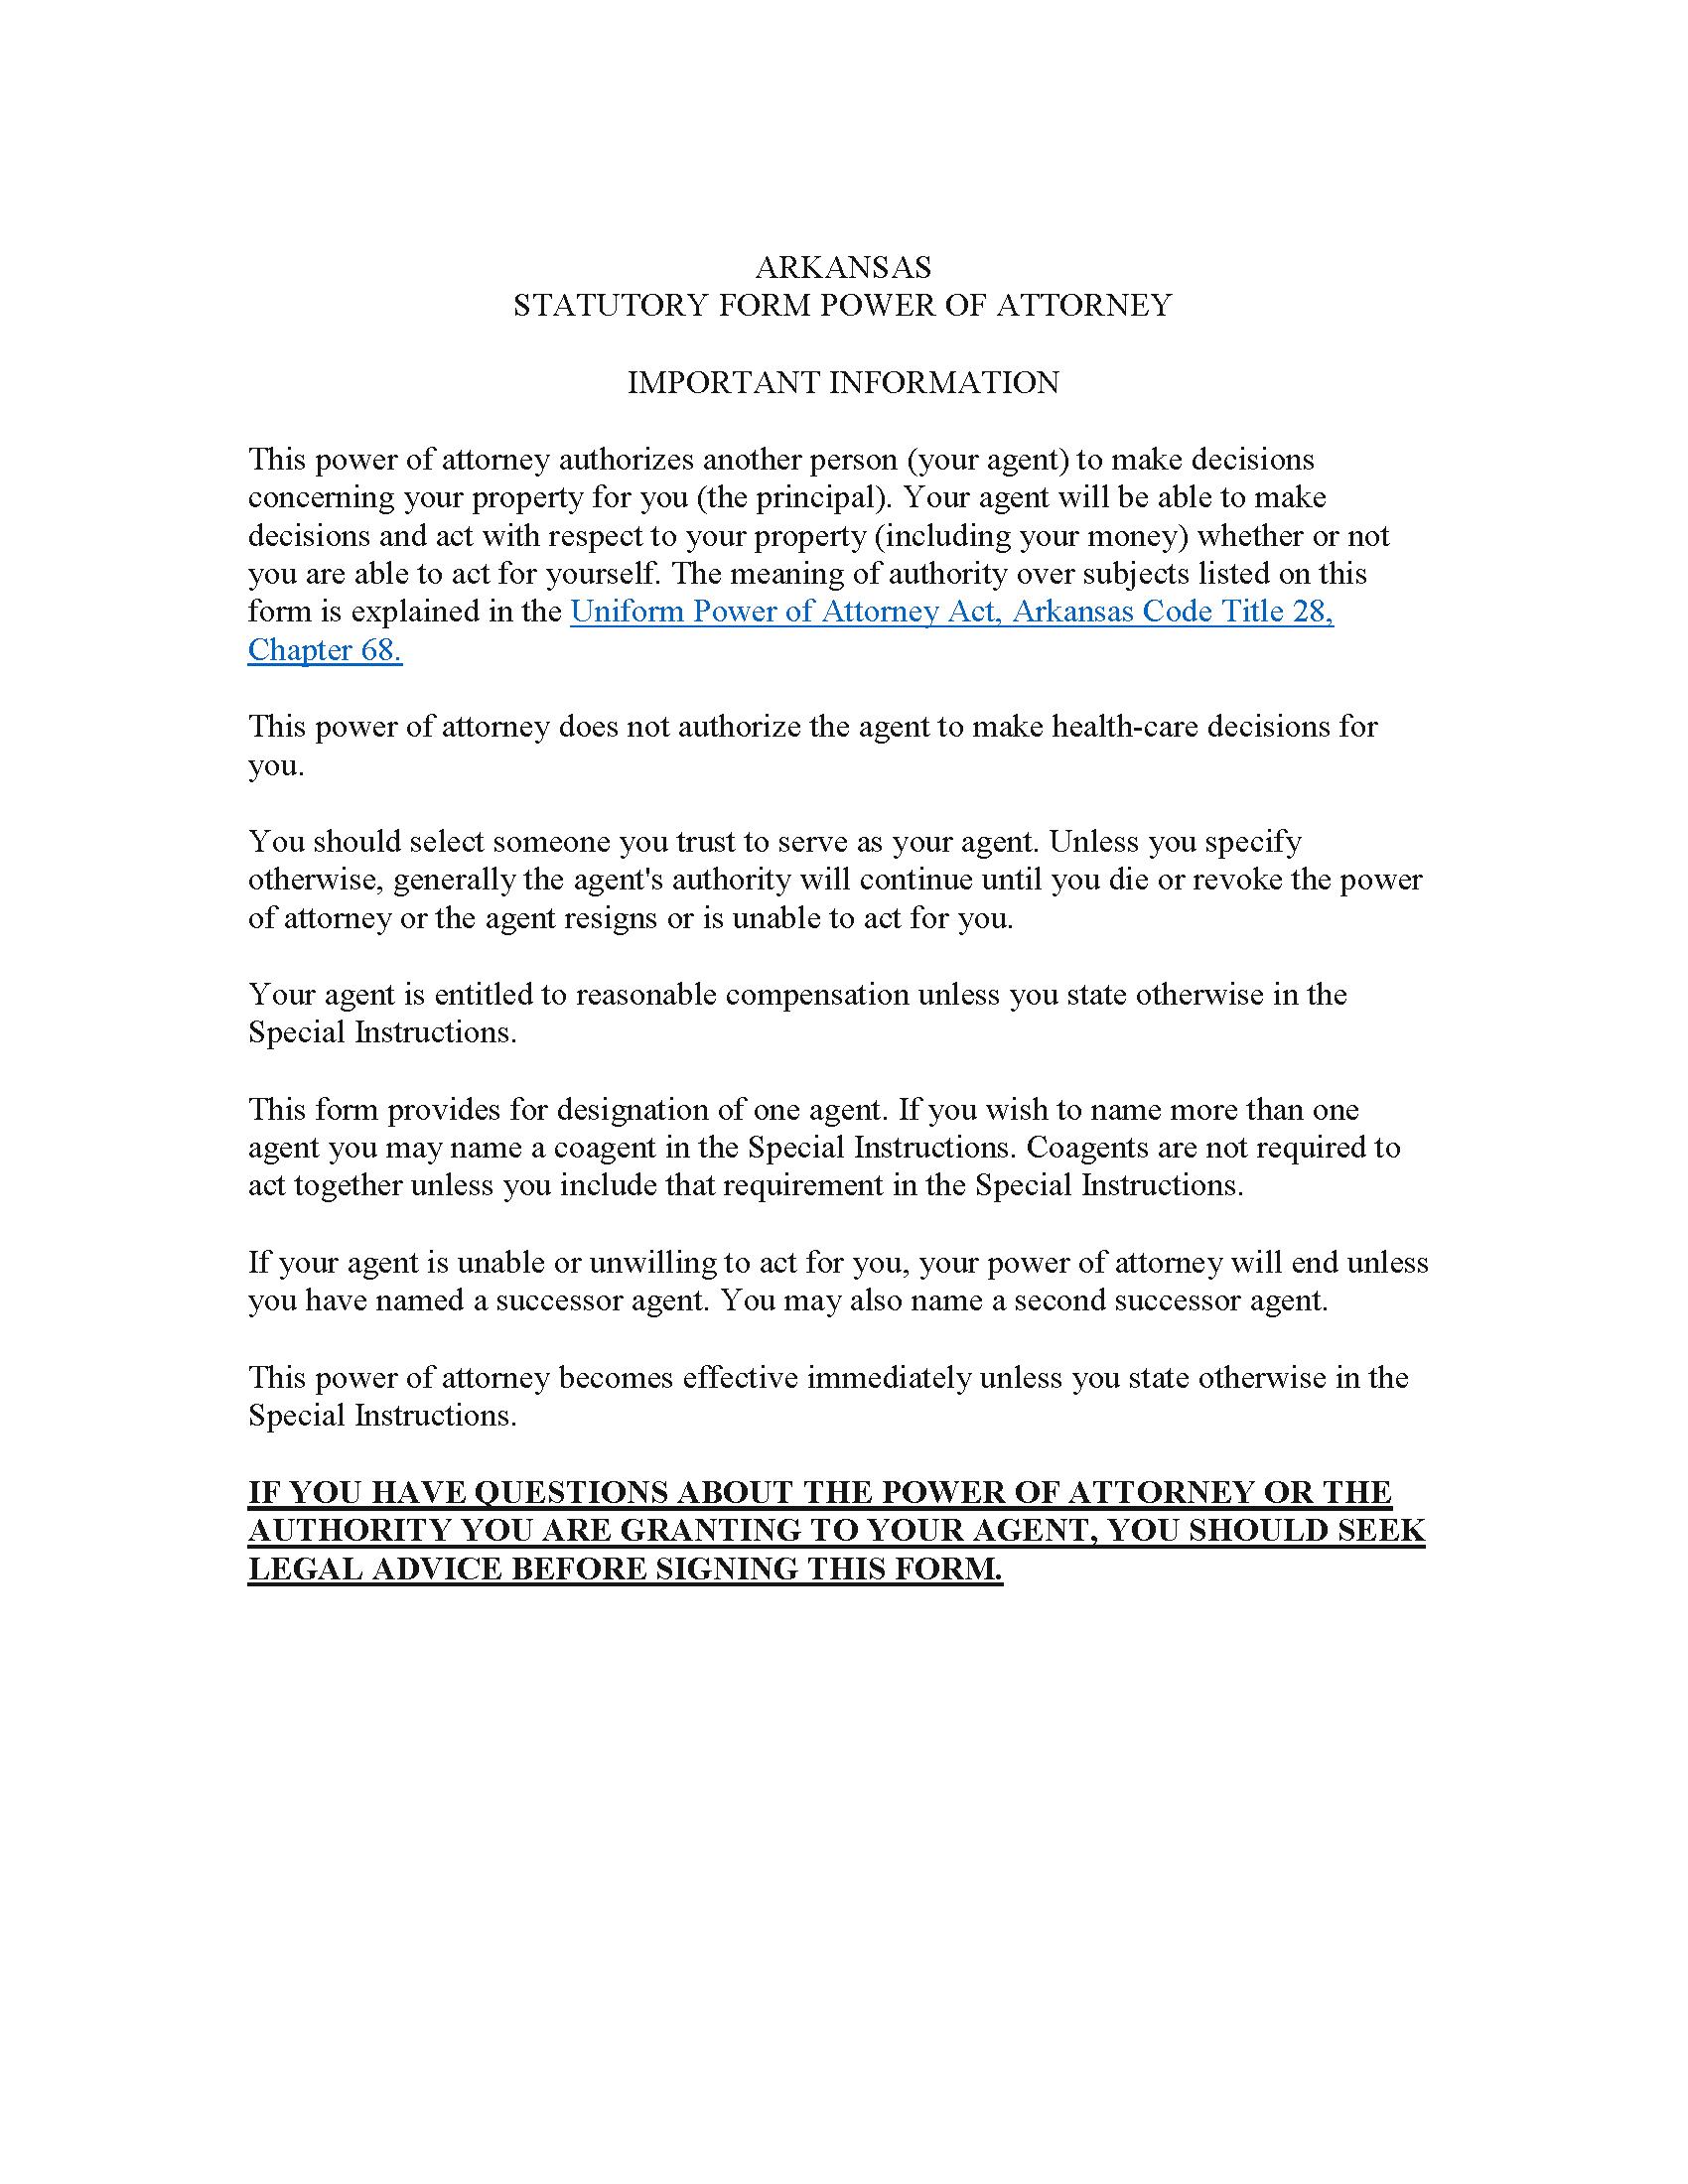 Arkansas Financial Power of Attorney Form